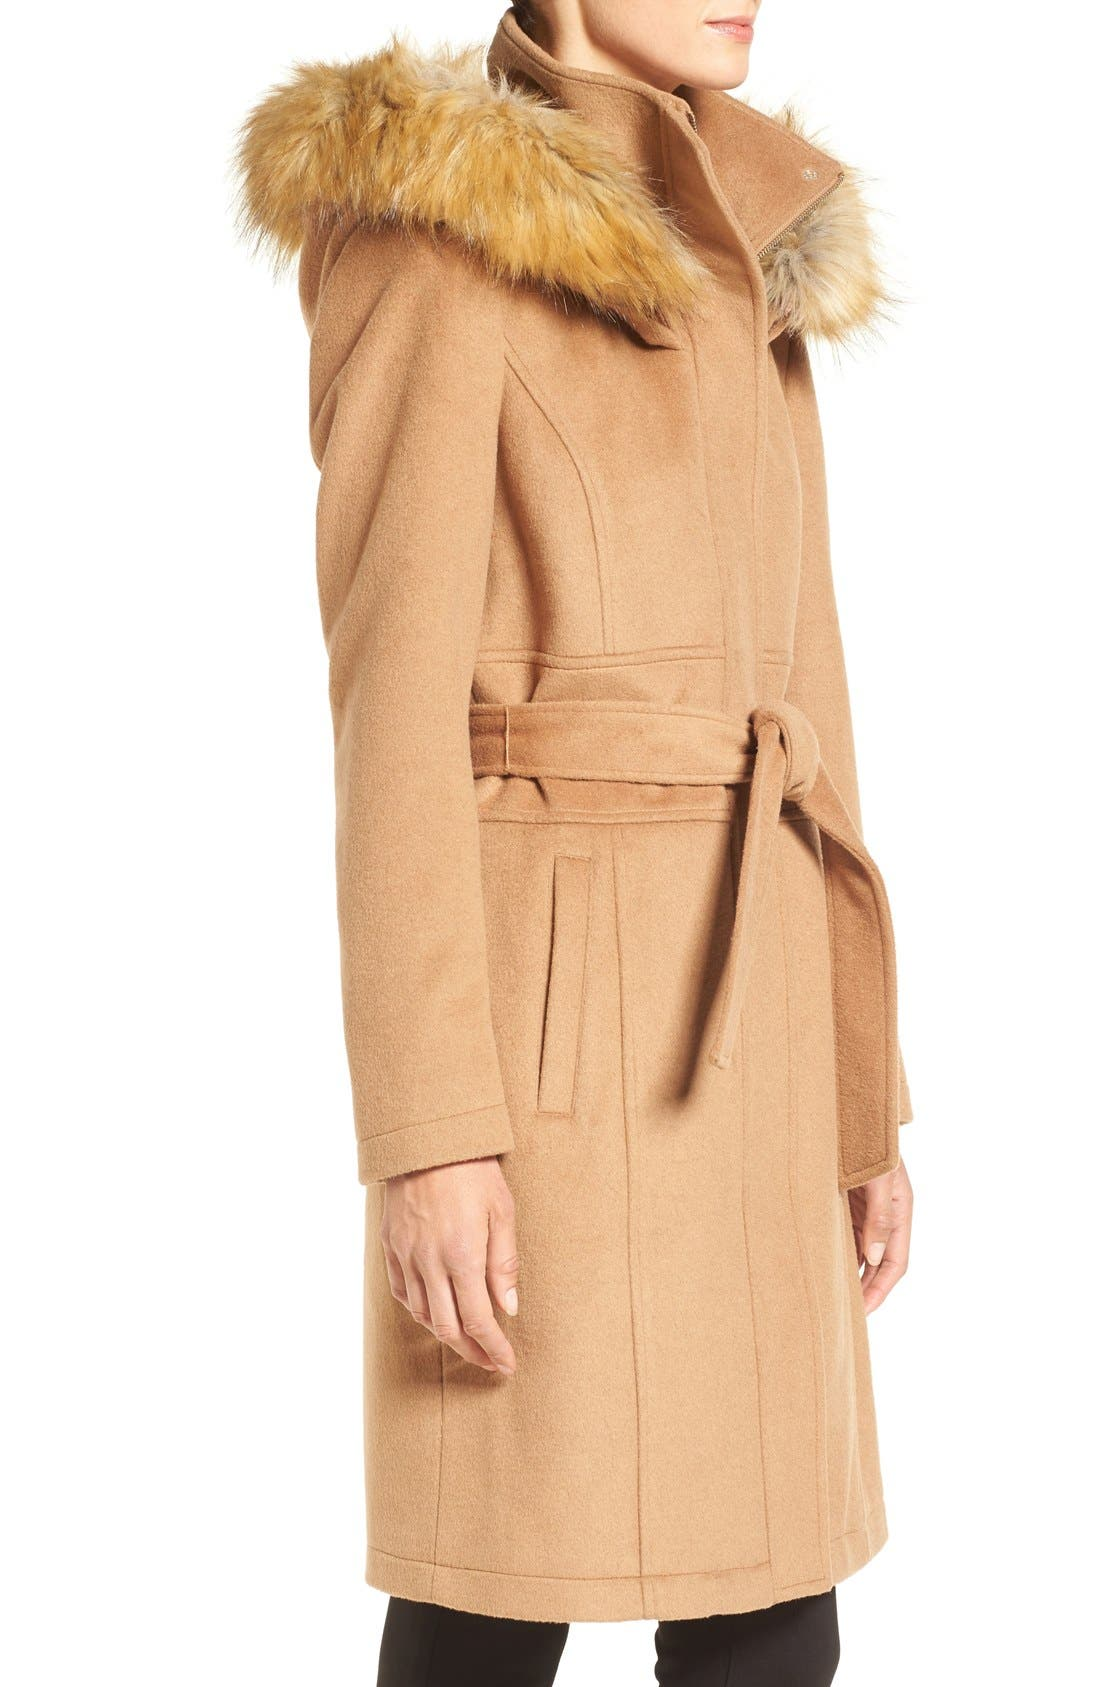 Alternate Image 3  - Ivanka Trump Wool Blend Coat with Removable Faux Fur Trim Hood